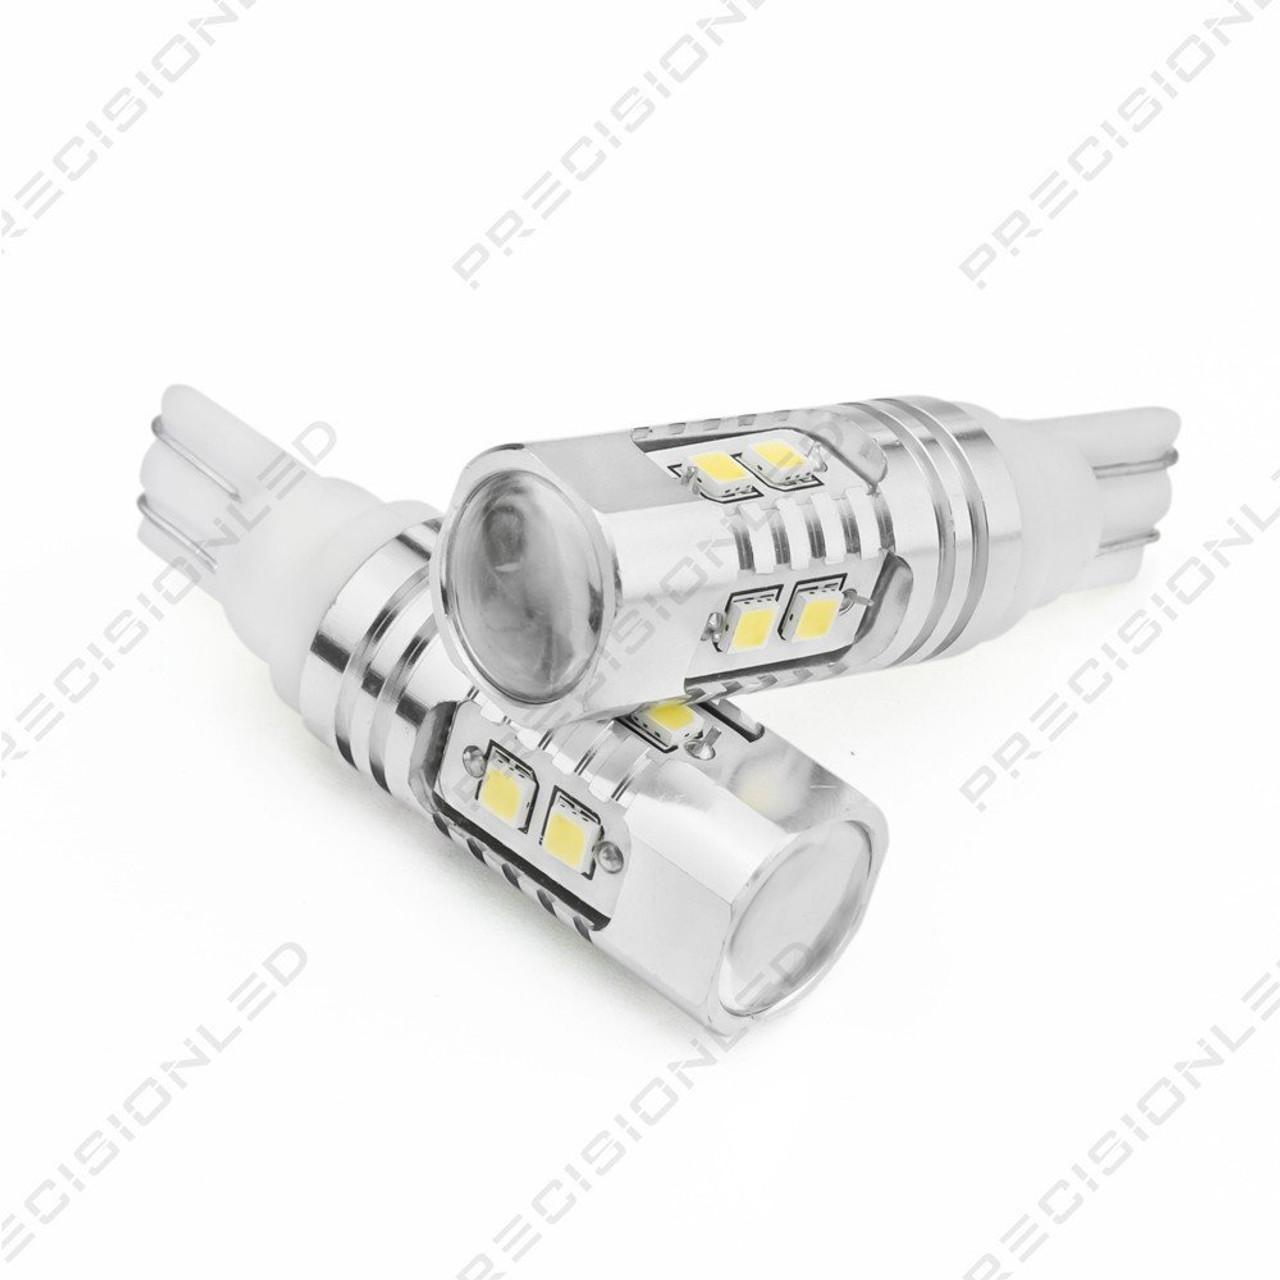 Cadillac XTS LED Backup Reverse Lights (2013-Present)